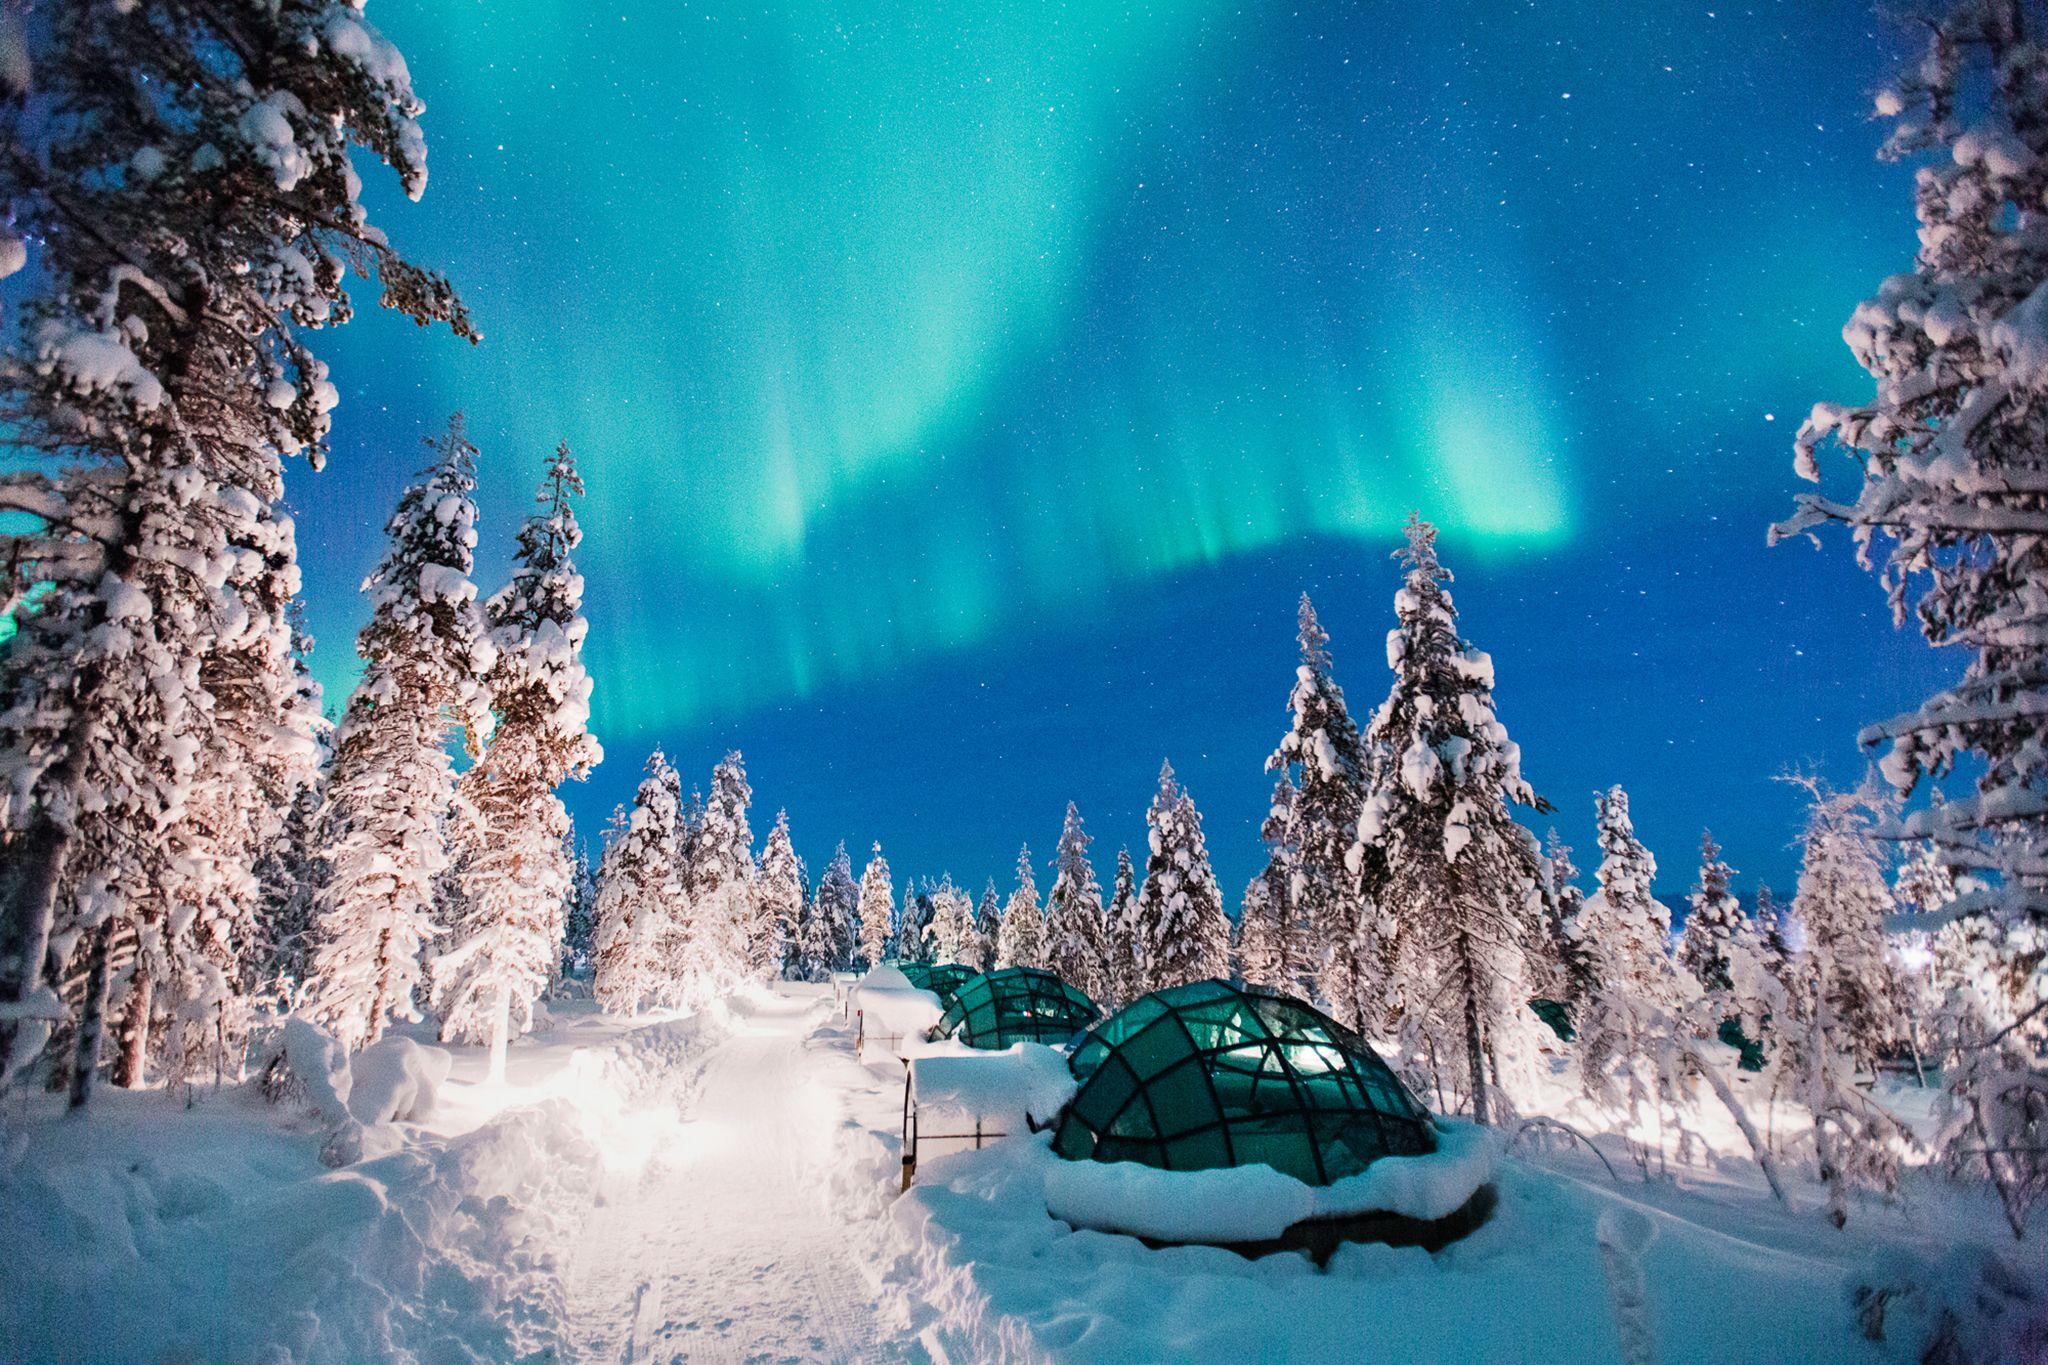 Image result for Kakslauttanen Hotel and Igloo Village, Finland - Northern Lights